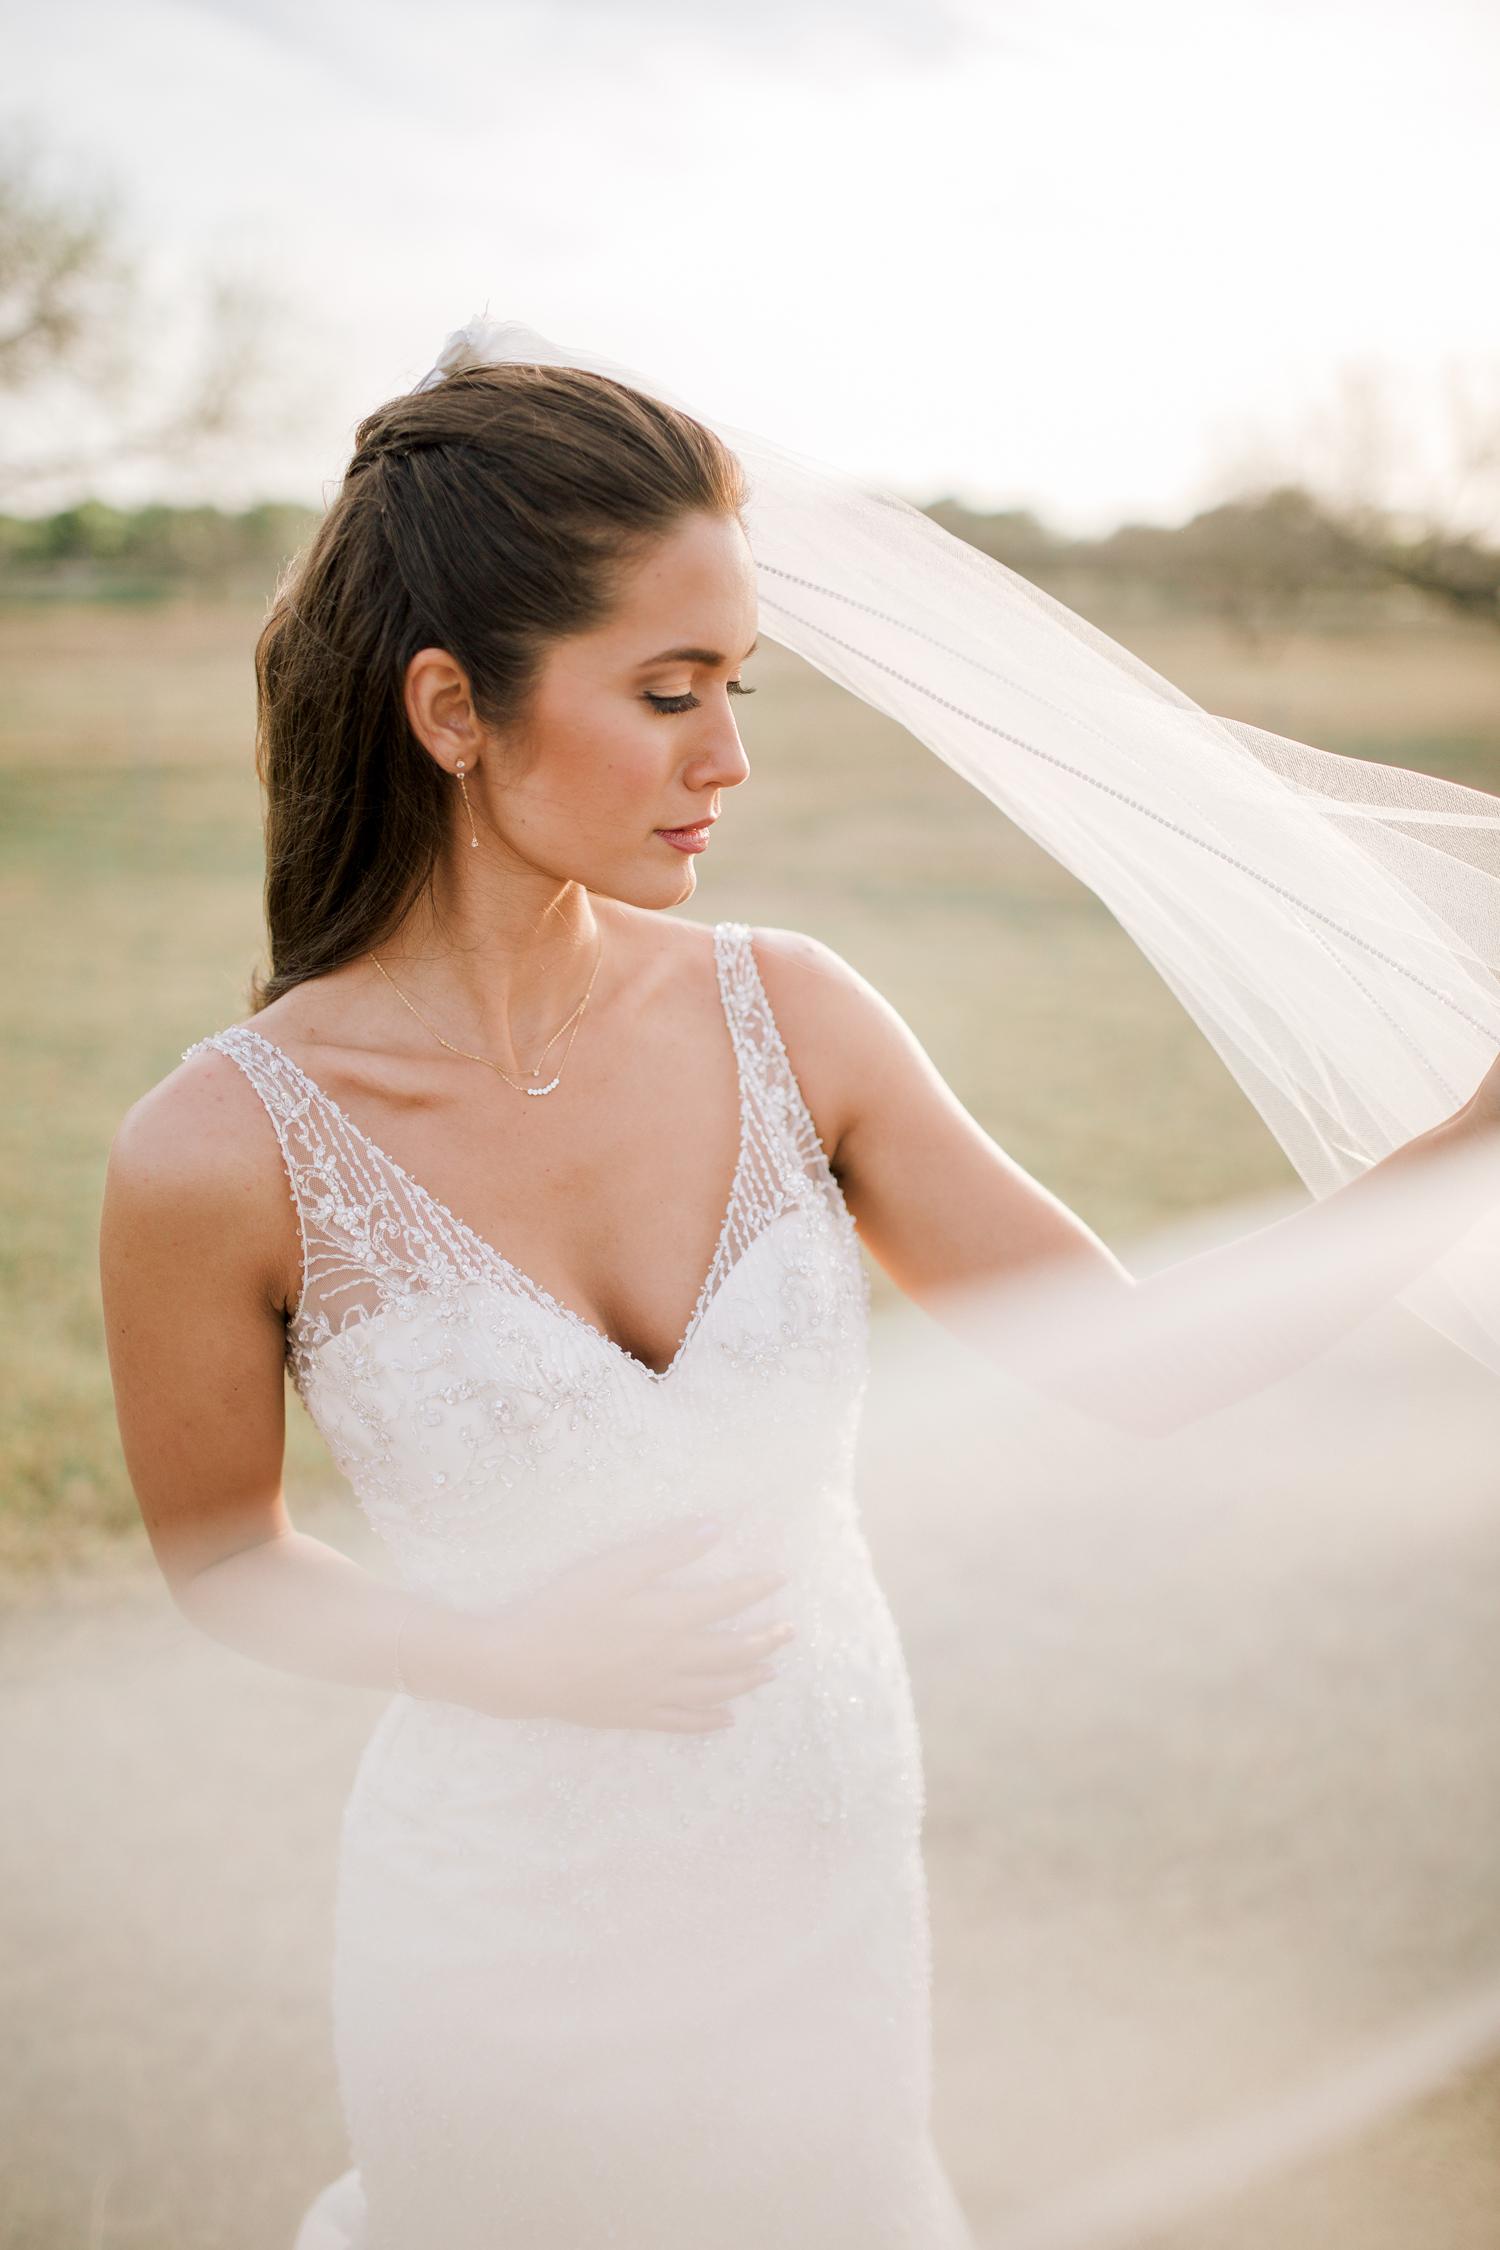 alaa-marzouk-photography-rgvweddingphotographer-rio-grande-valley-mathis-wedding-bridal-bride-san-antonio-portrait-weddings-mcallen-128.jpg